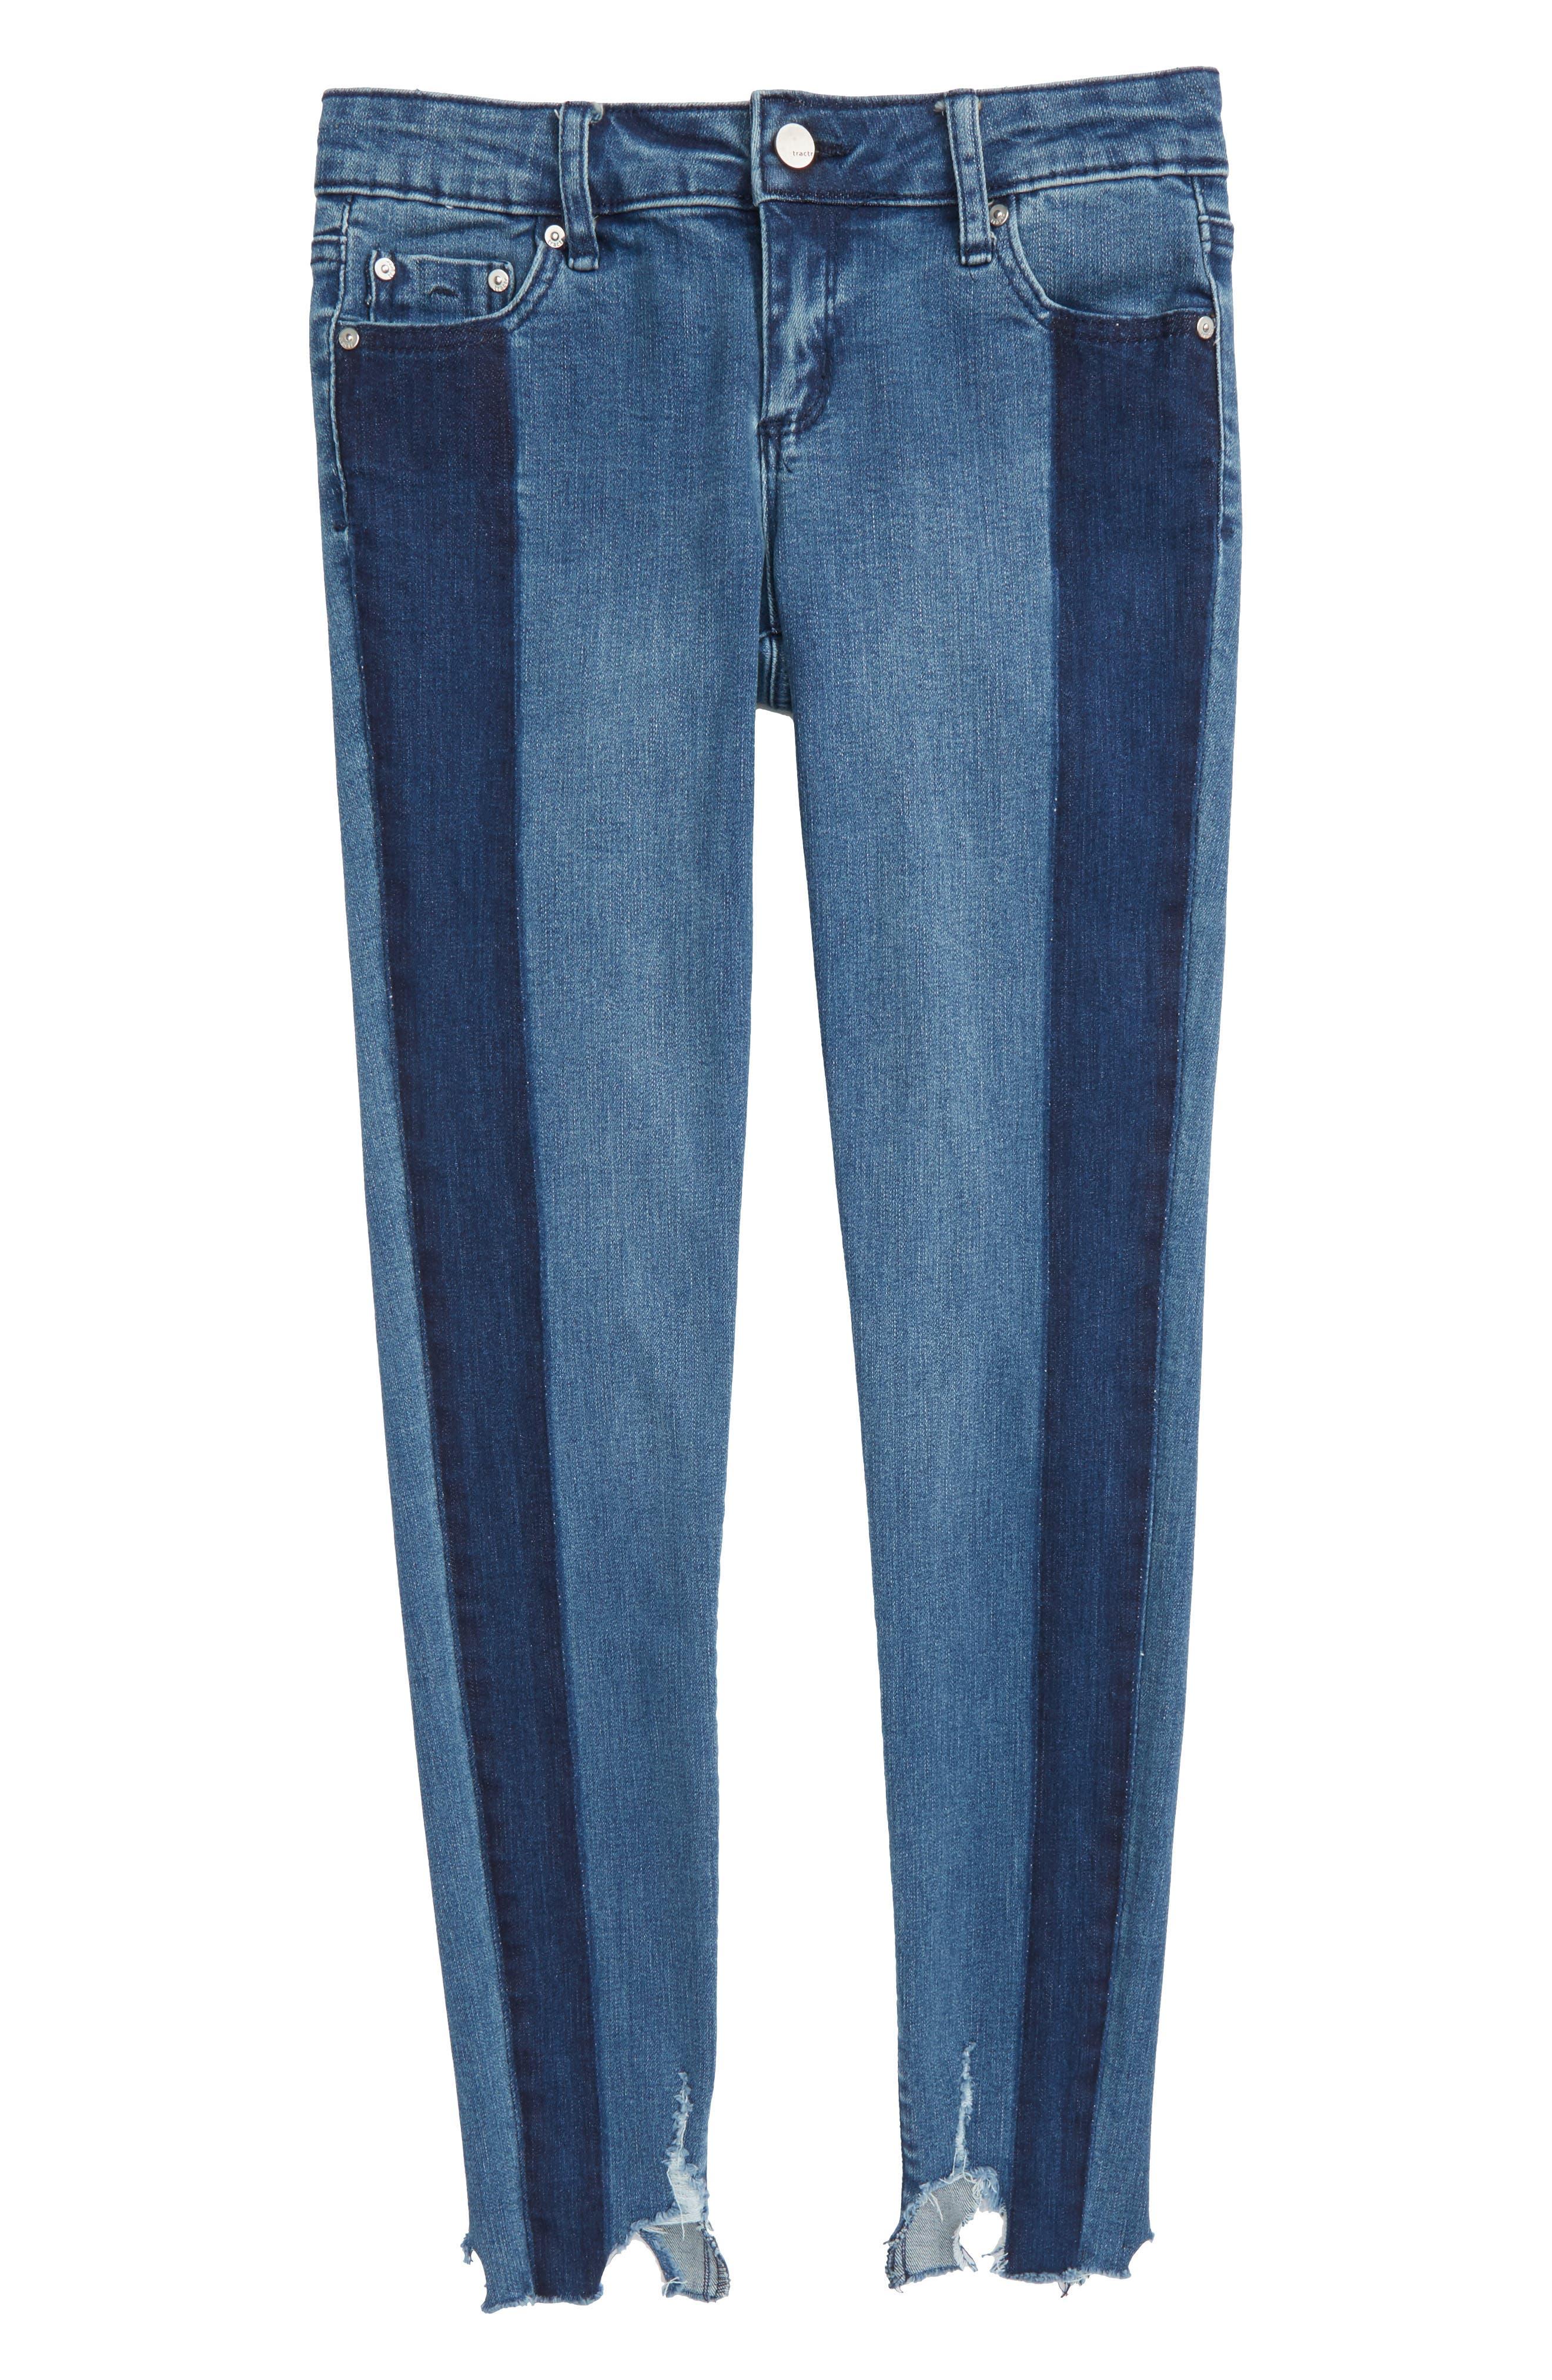 Main Image - Tractr Crop Skinny Jeans (Big Girls)